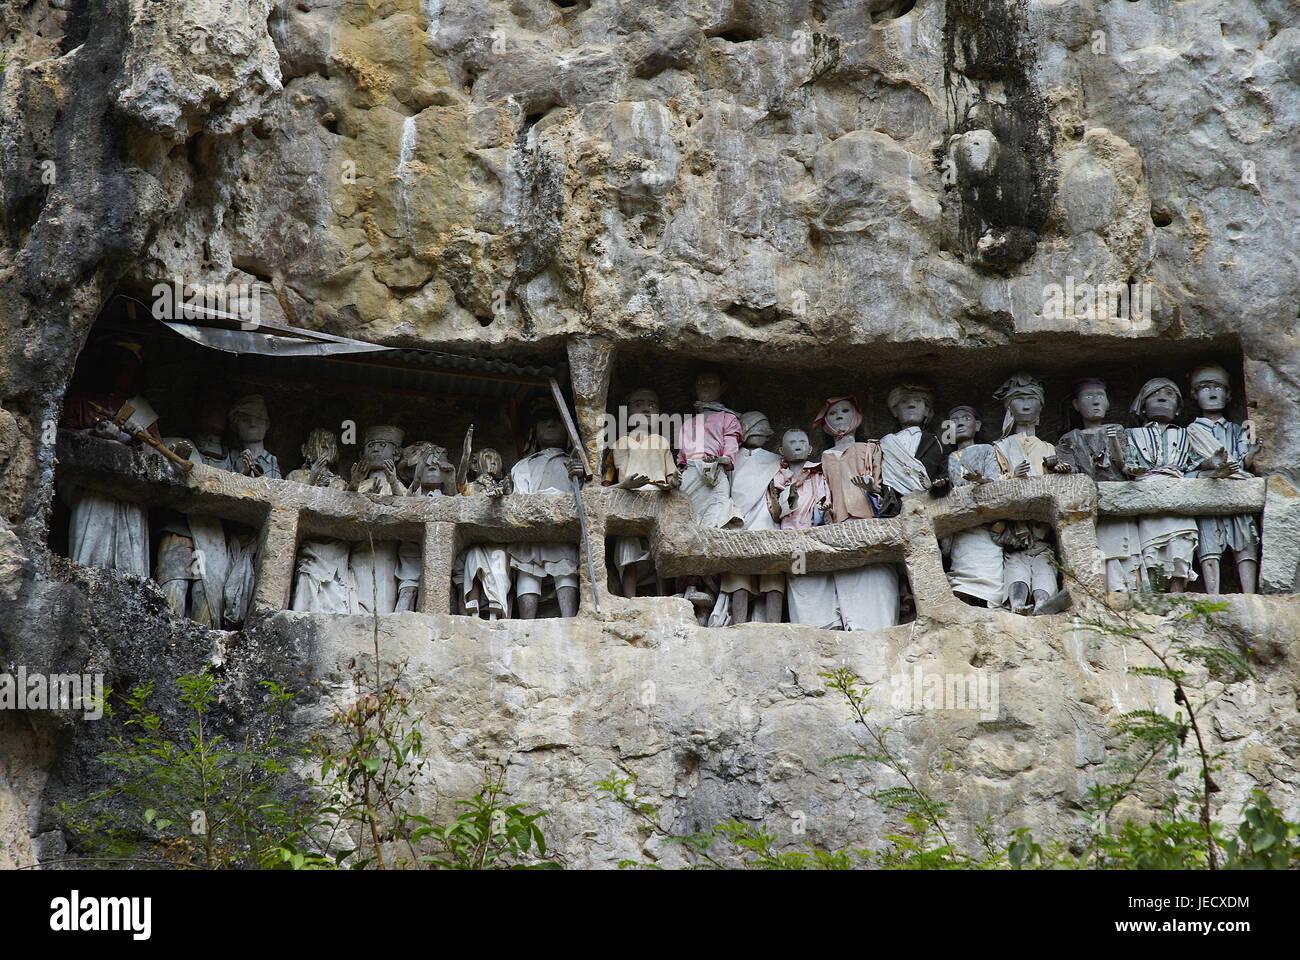 Indonesia, Sulawesi, Tana's goal nanny, tomb characters, - Stock Image